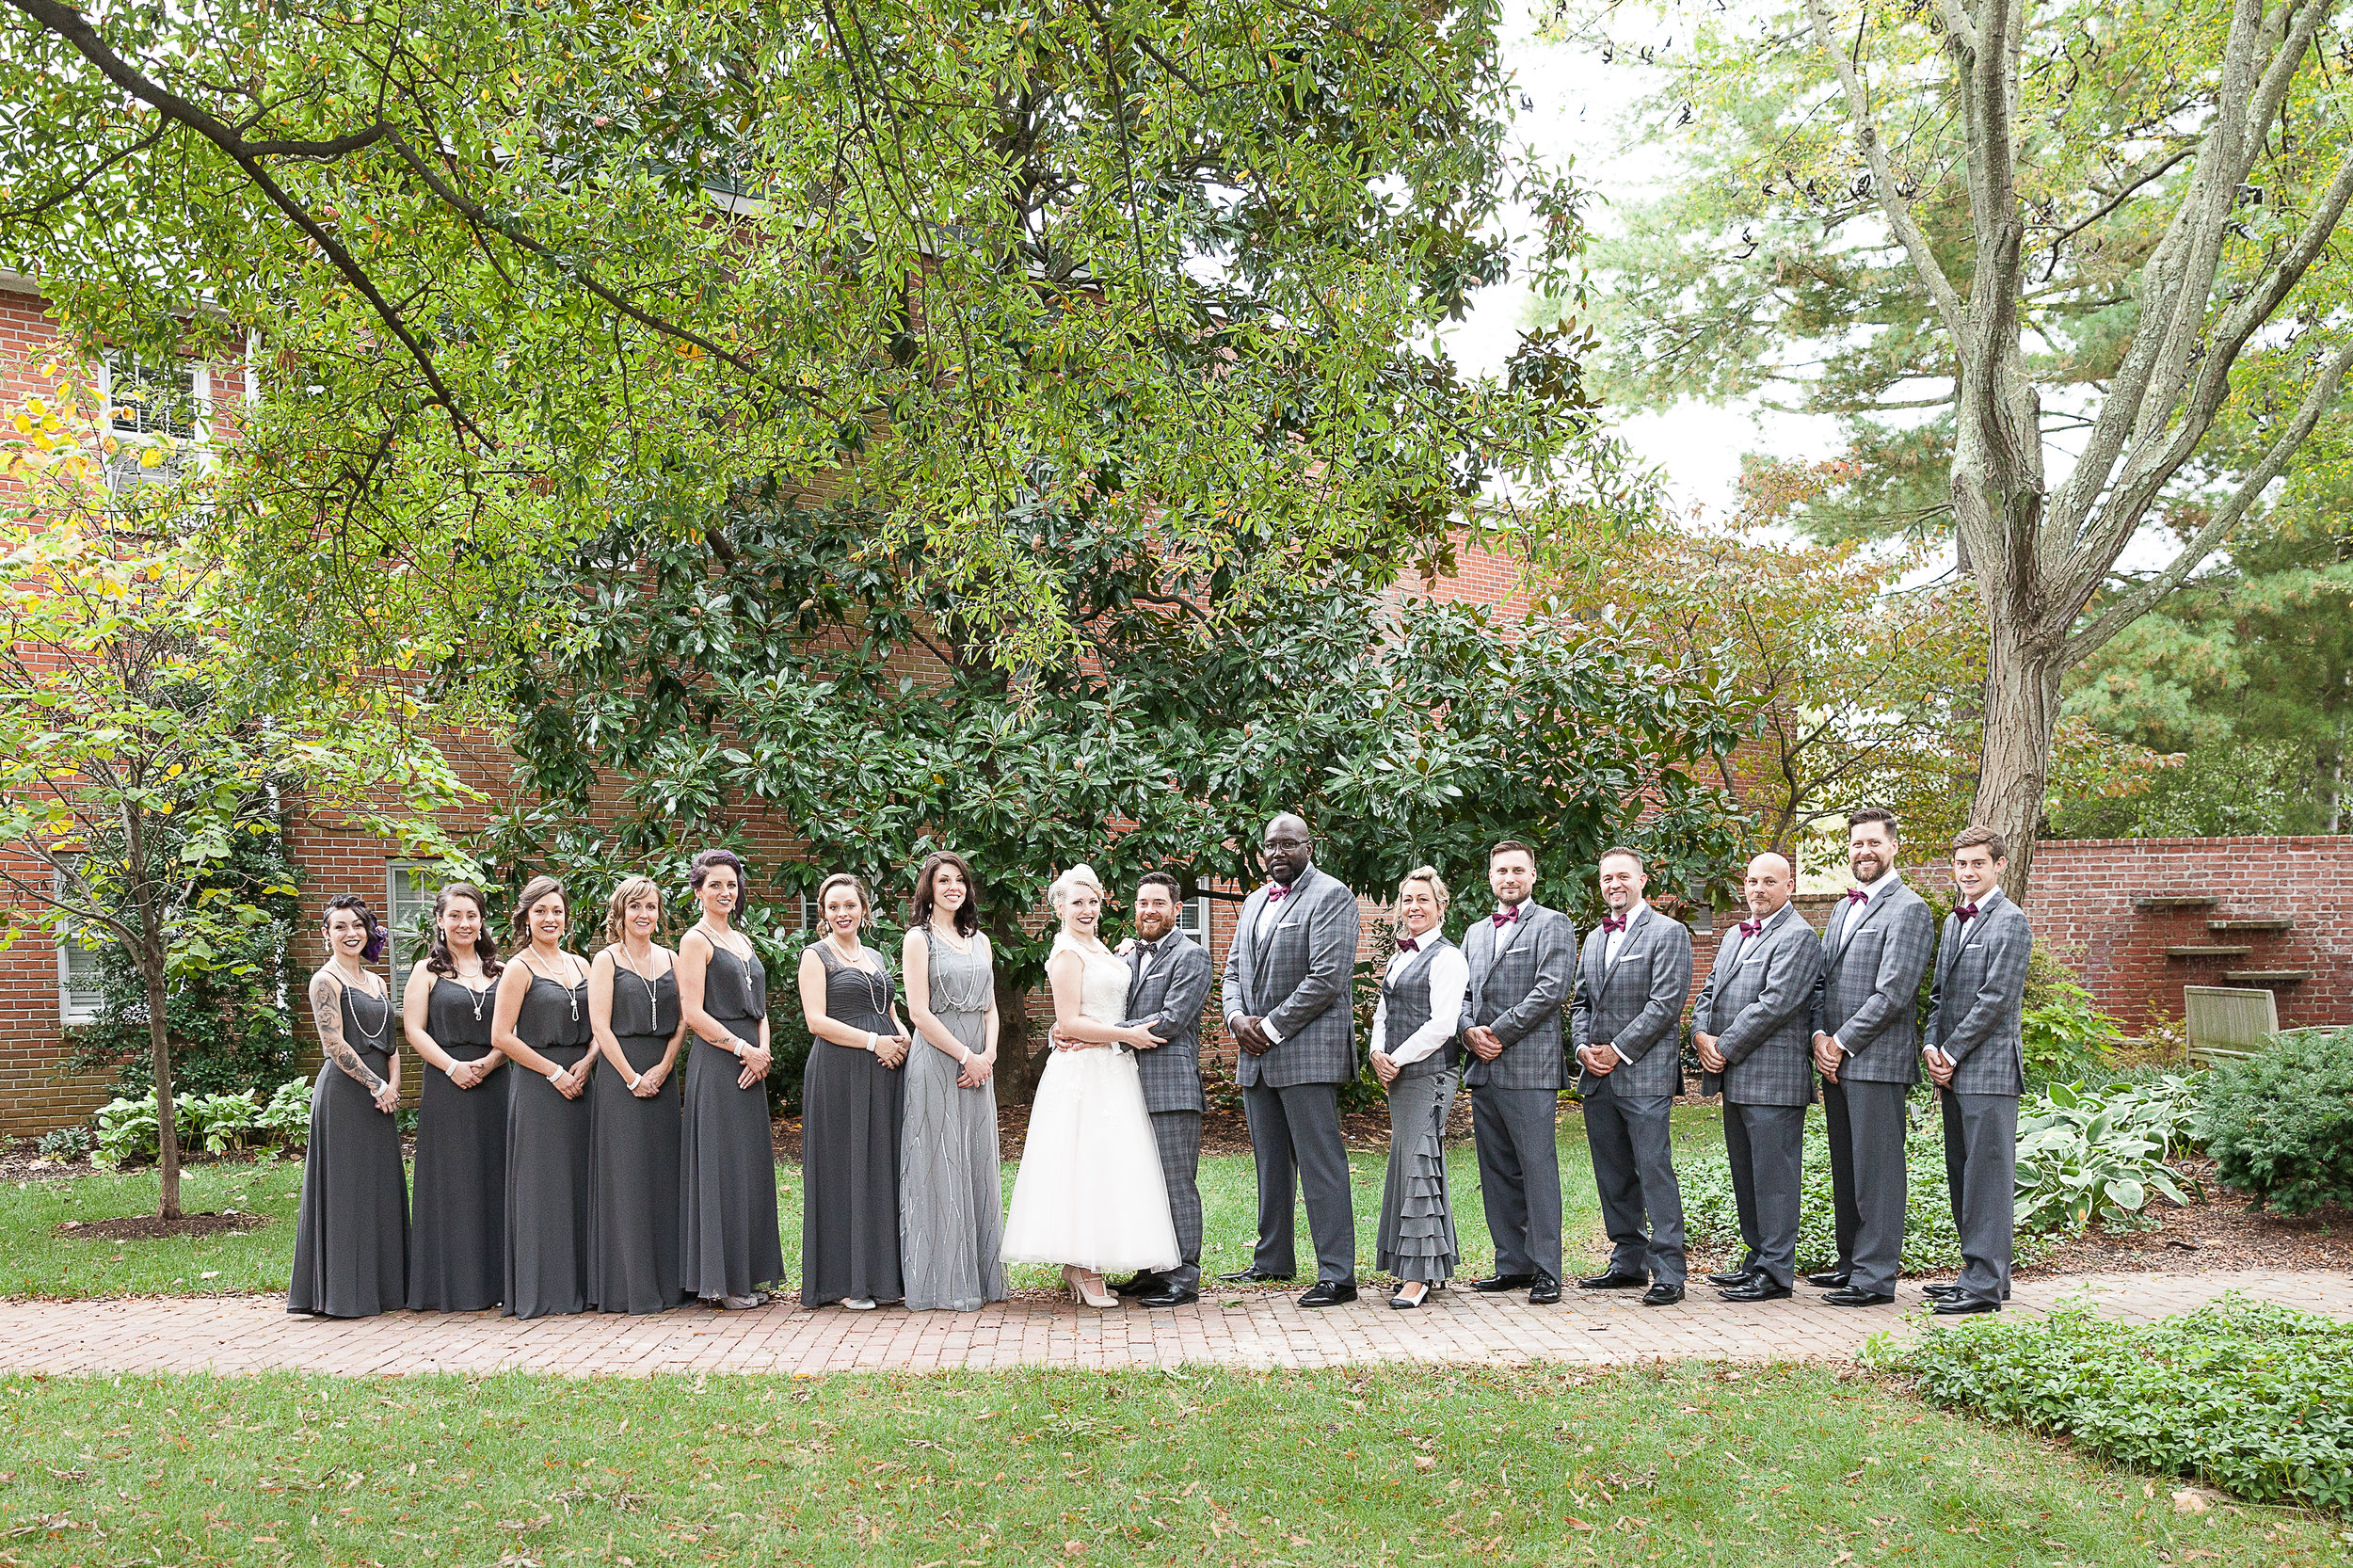 25-01-Ashleigh-RJ-Wedding-Kim-Pham-Clark-Photography.jpg